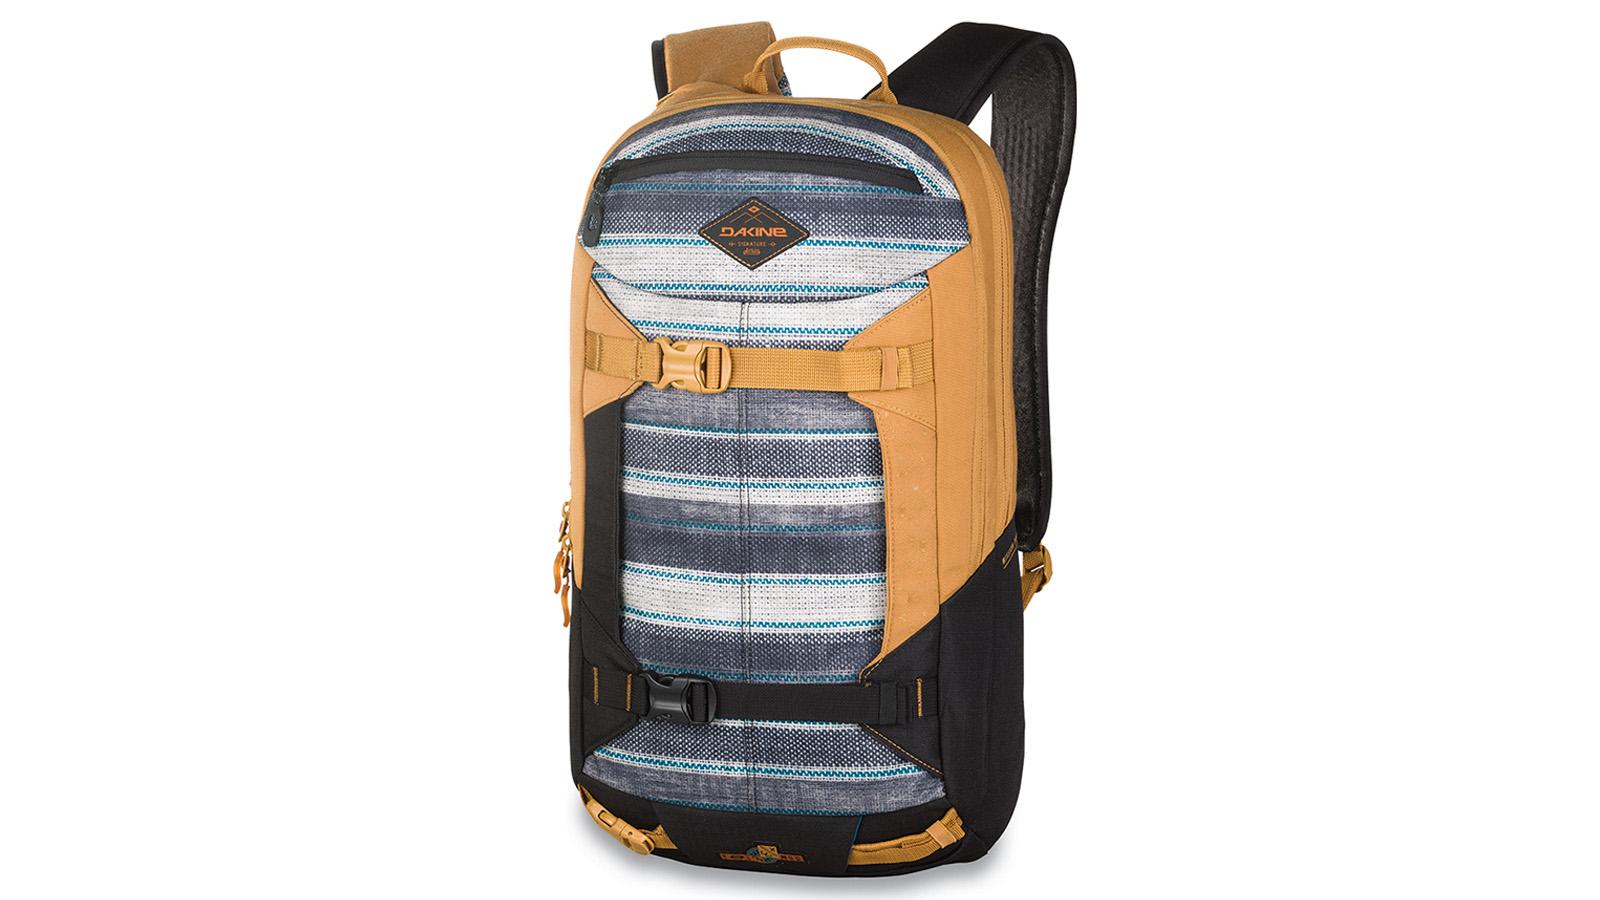 Dakine Backpacks FW17/18 Preview - Boardsport SOURCE